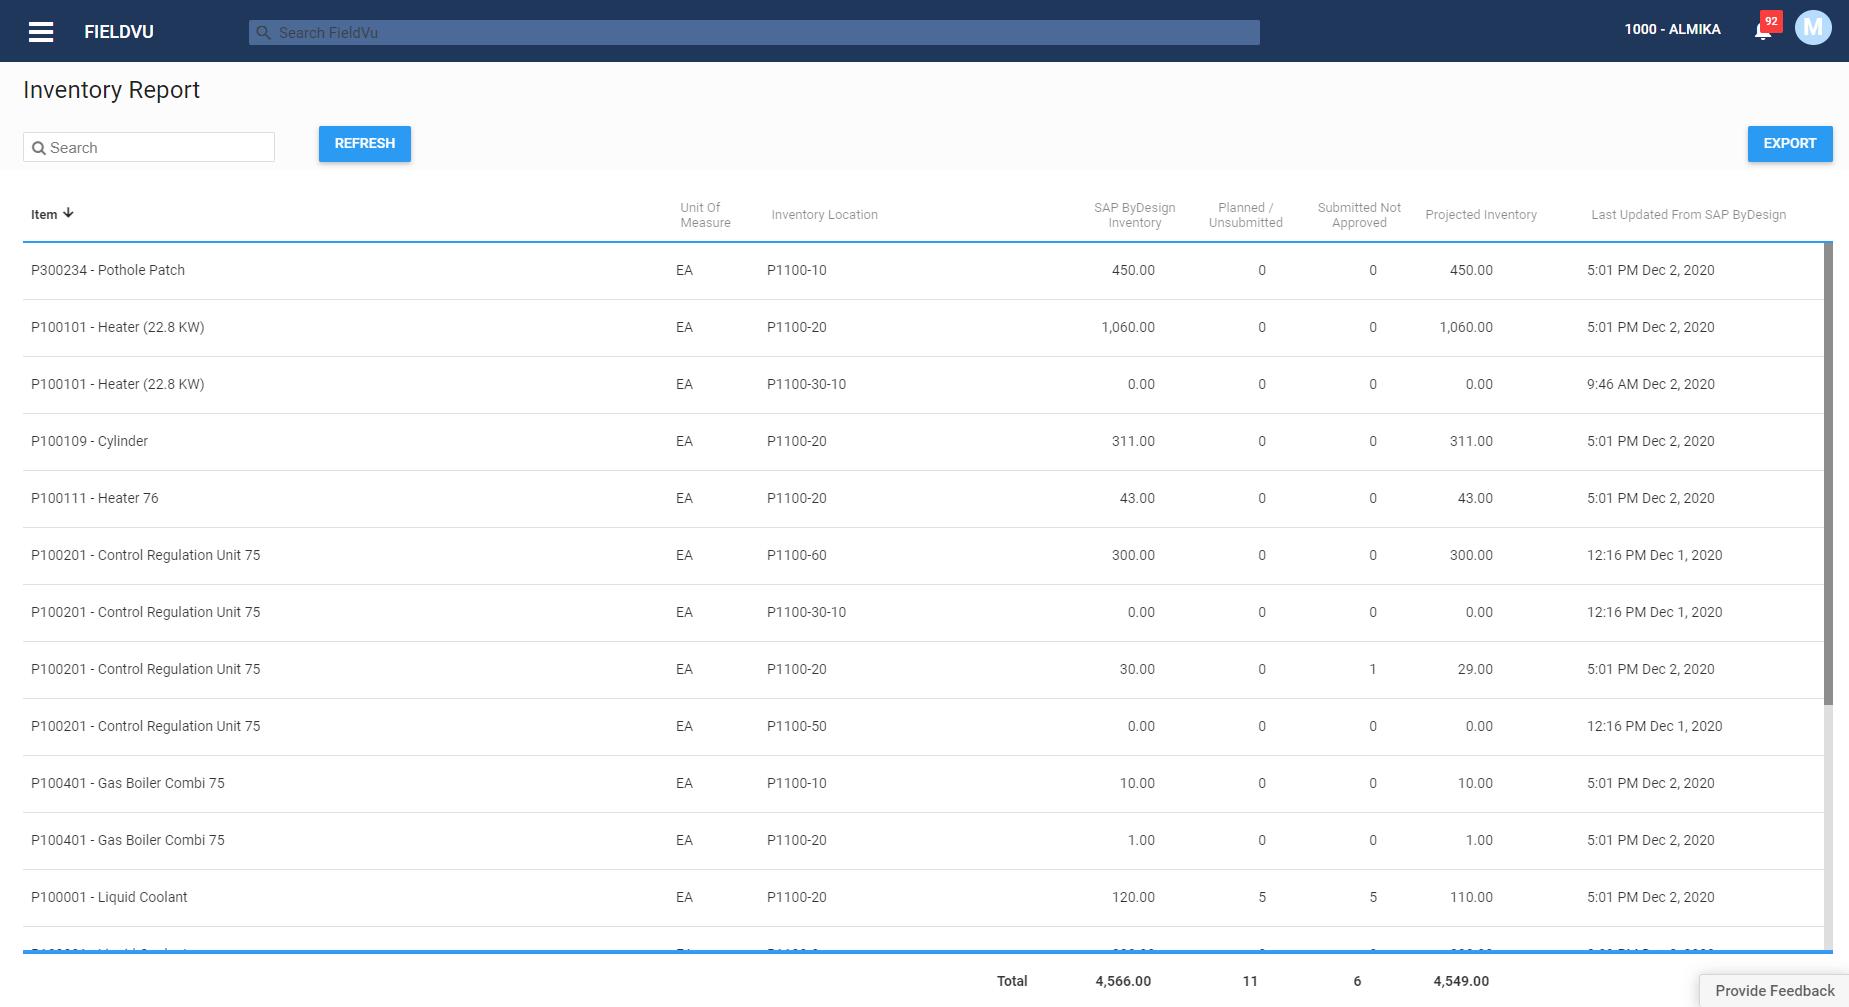 inventory report - fieldvu